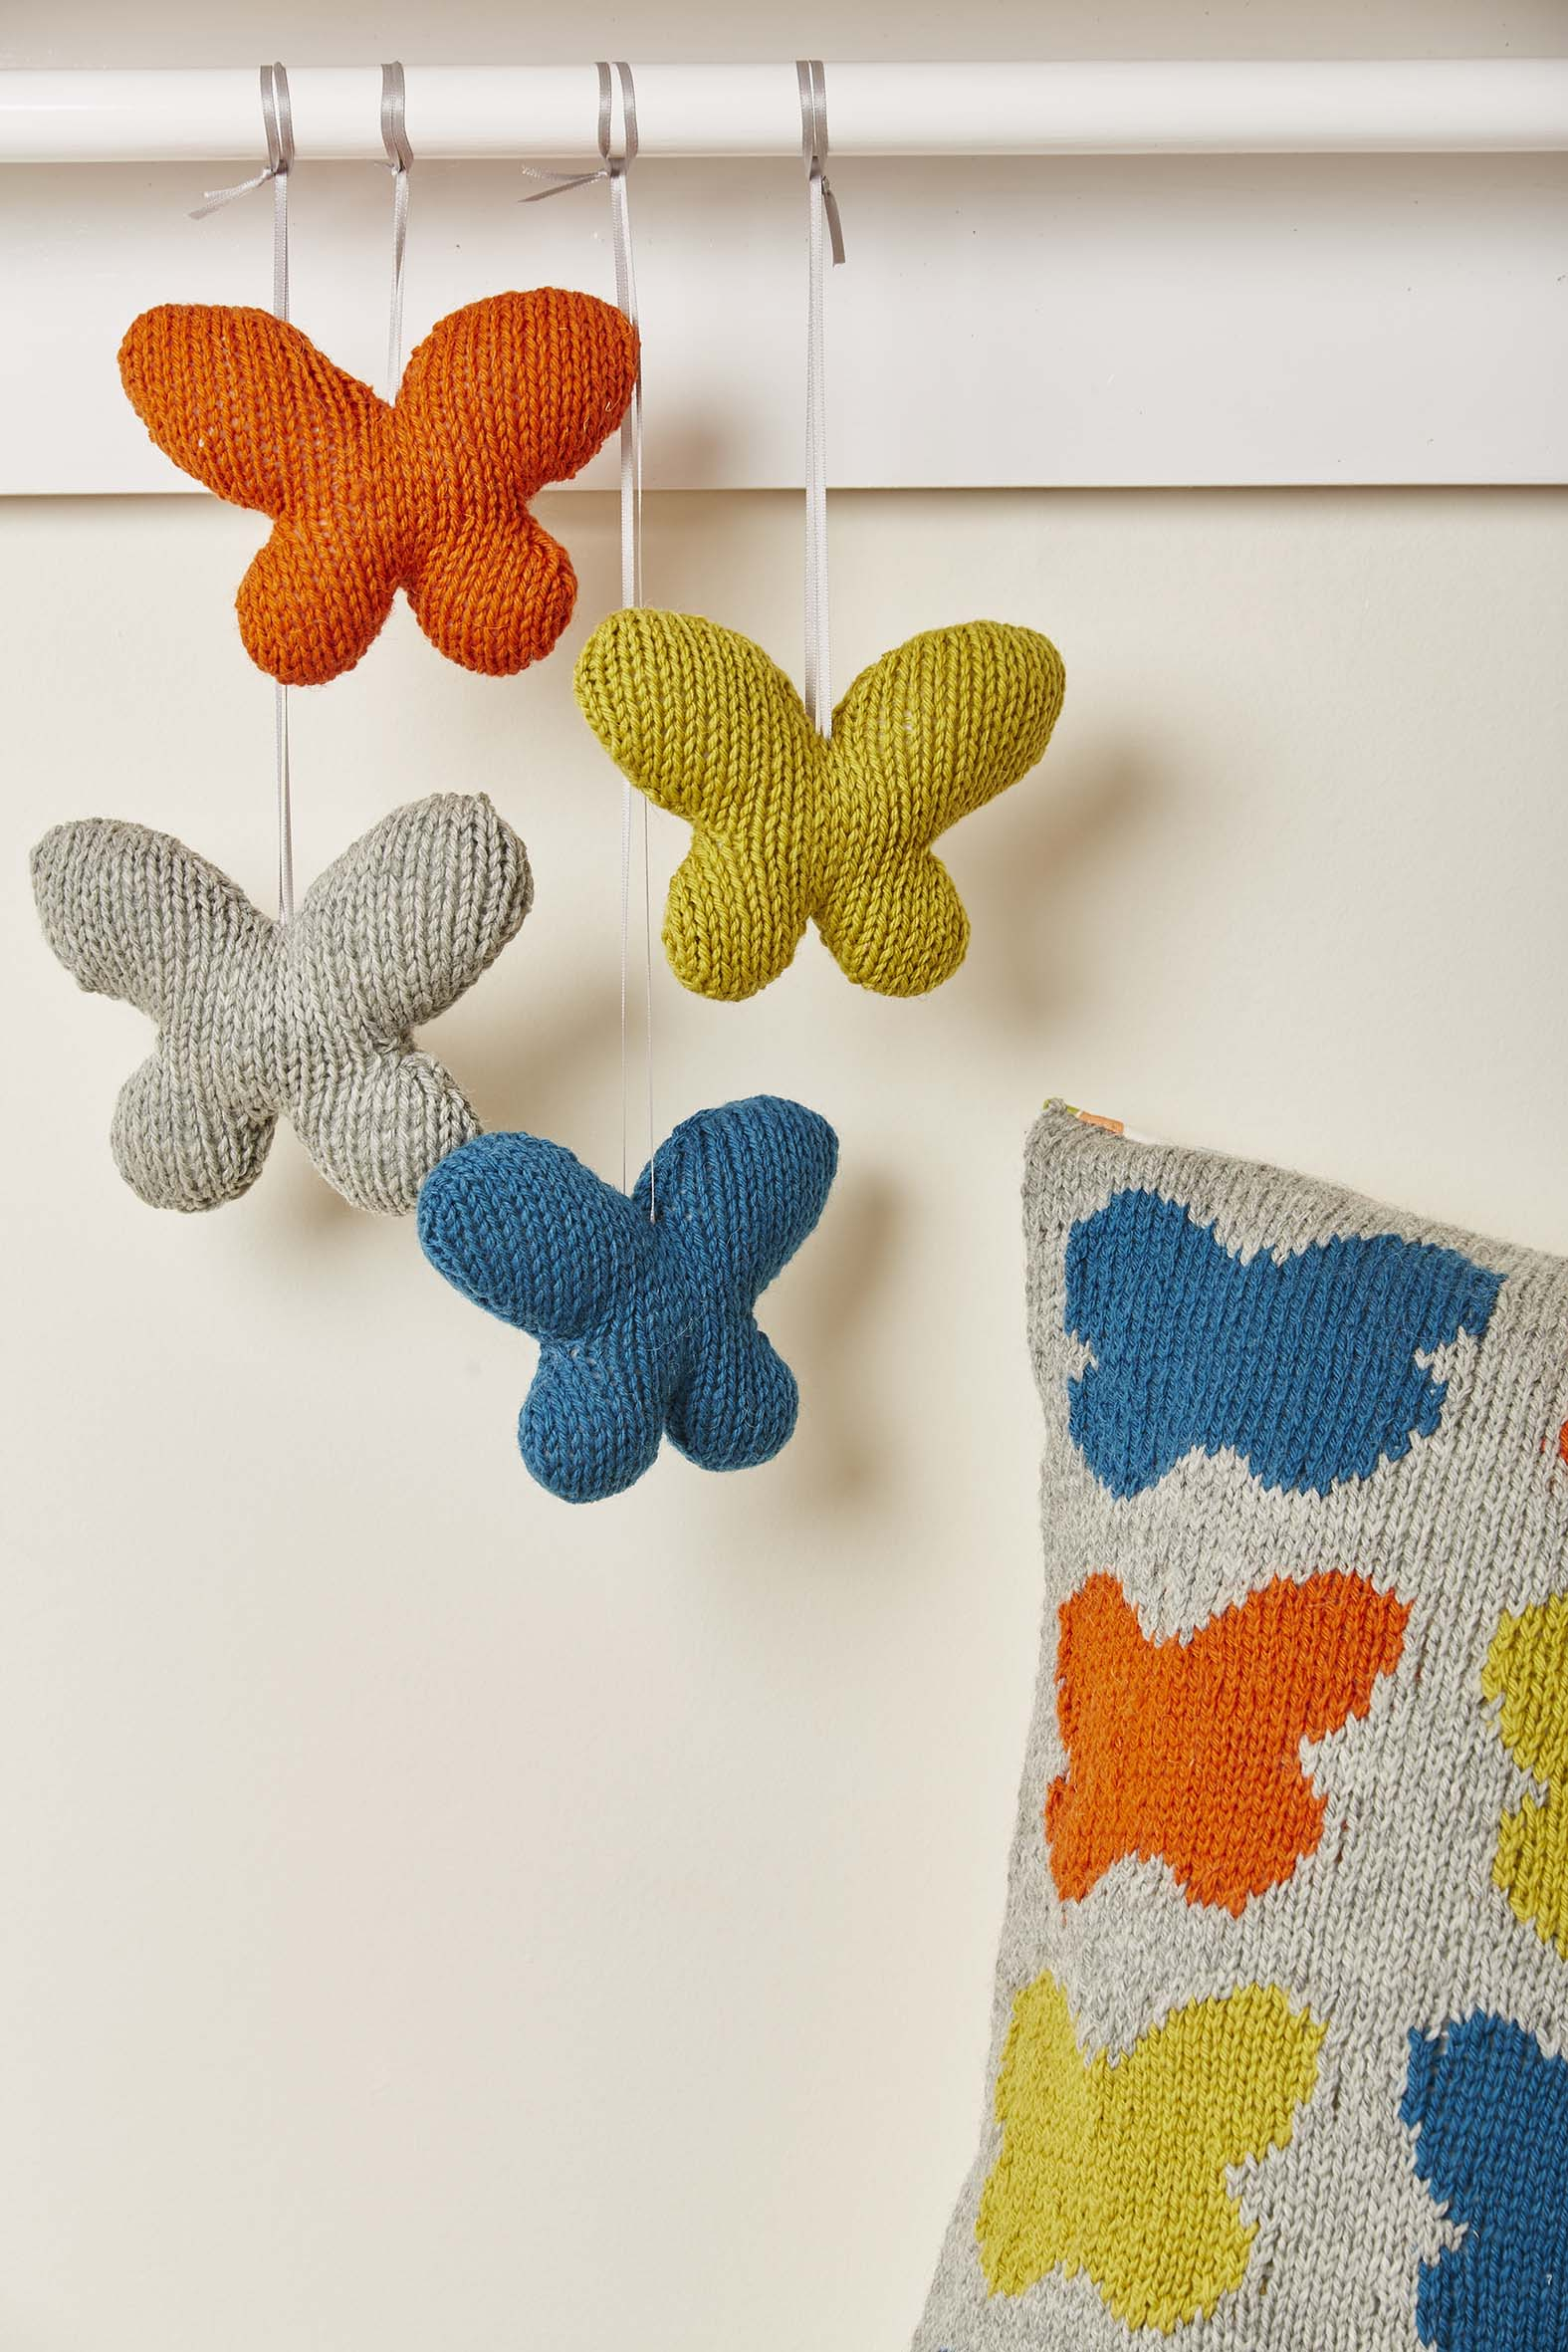 Knitted Nursey Collection Flutterbies Toy Butterflies